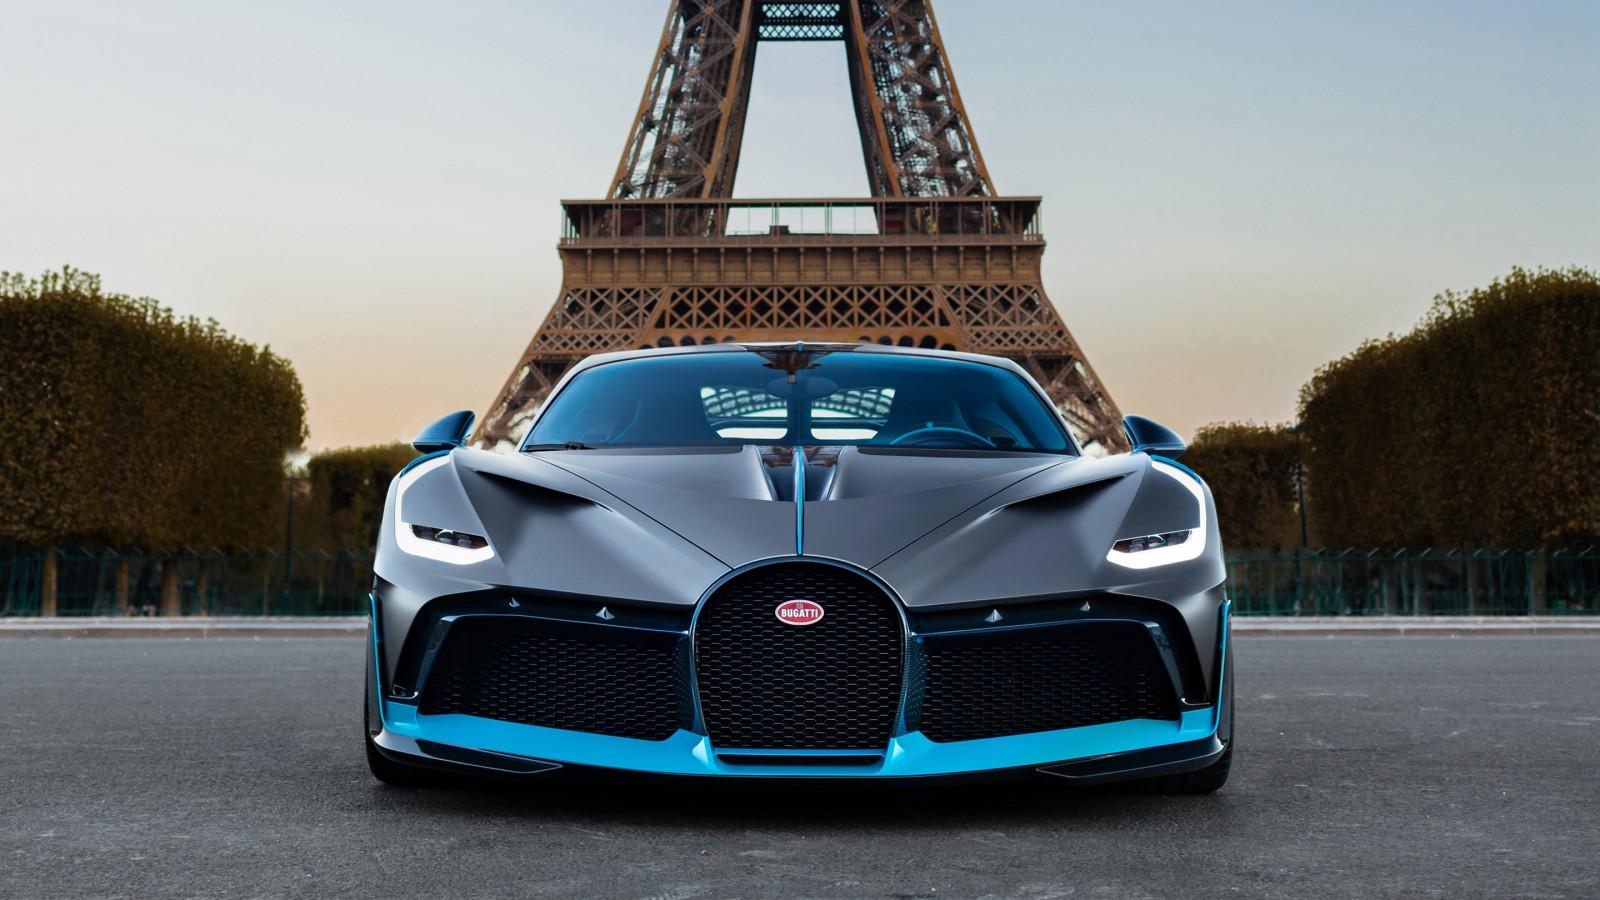 Bugatti Divo In Paris 2 Wallpaper Hd Car Wallpapers Id 11343